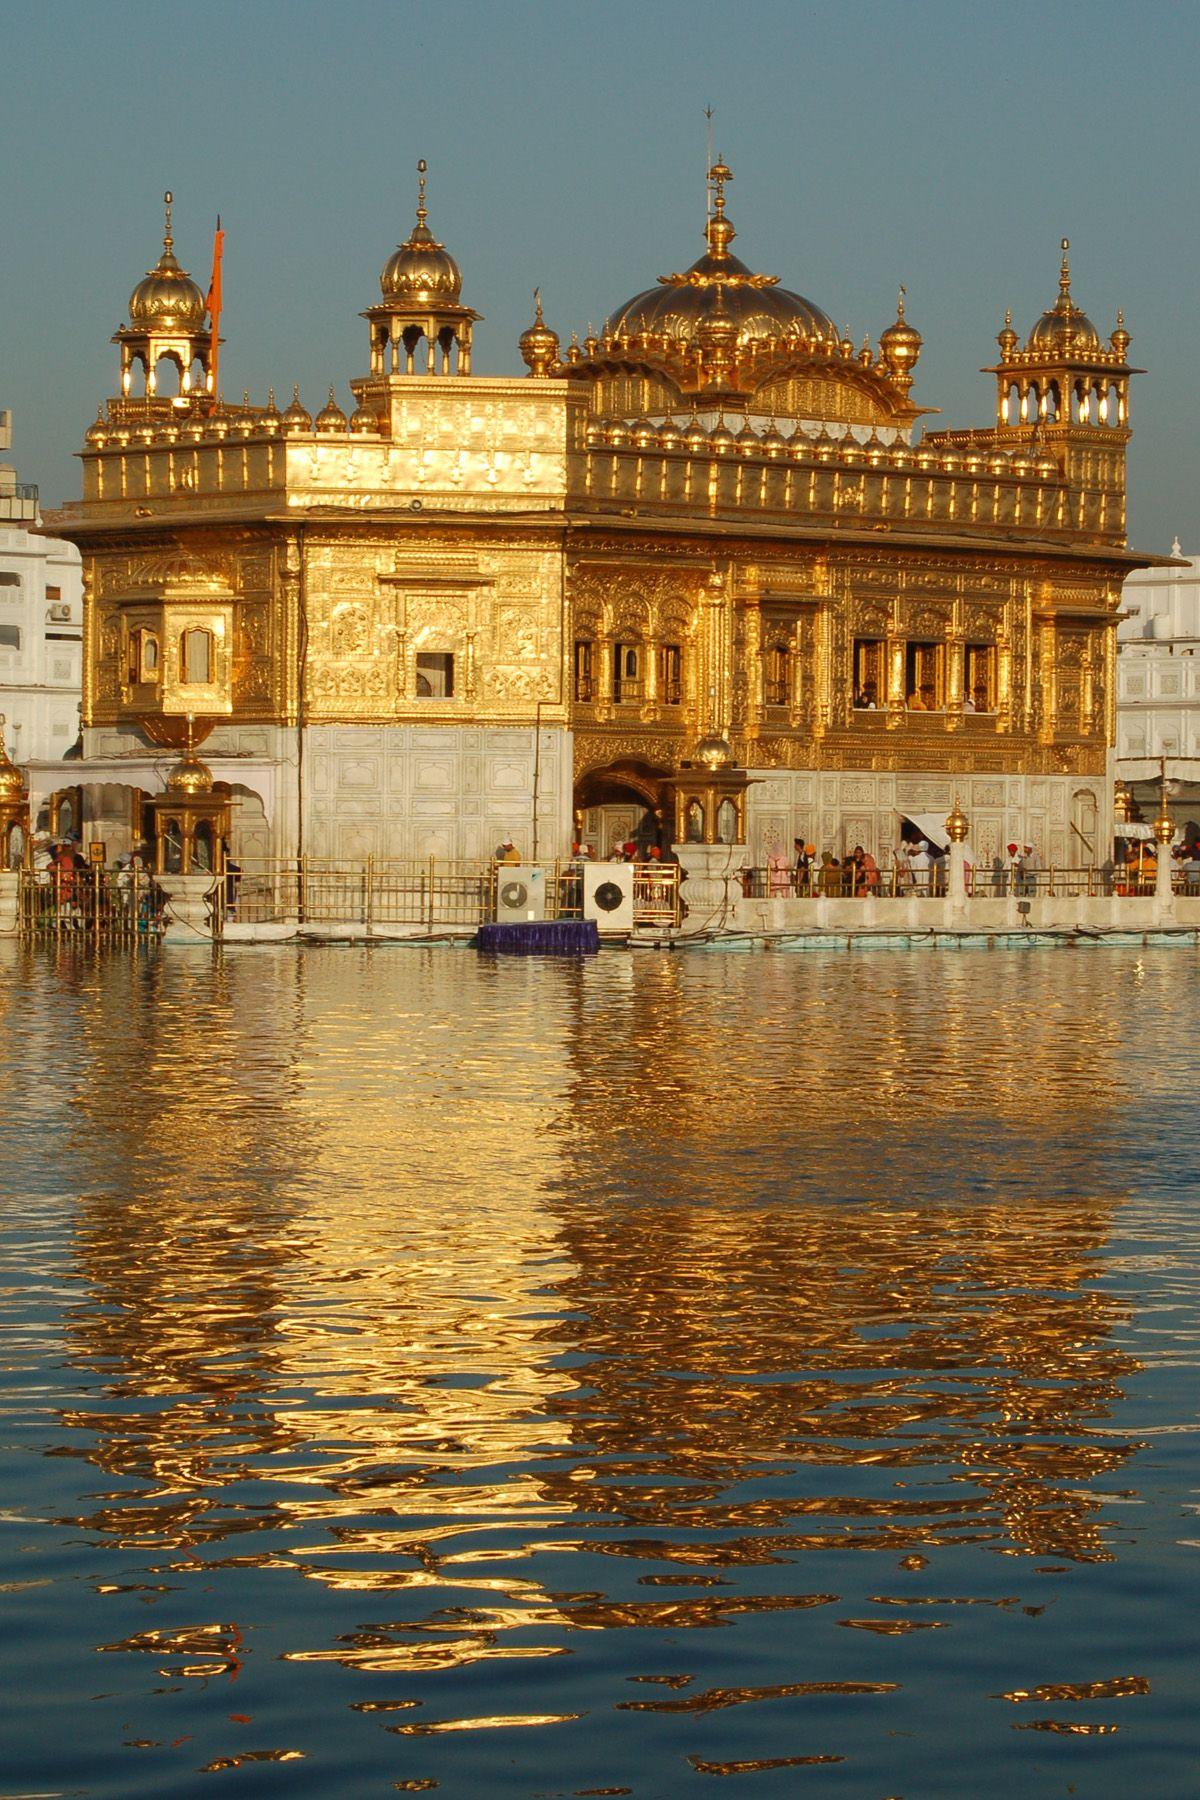 The Golden Temple Amritsar Golden Temple Amritsar Golden Temple Wonders Of The World